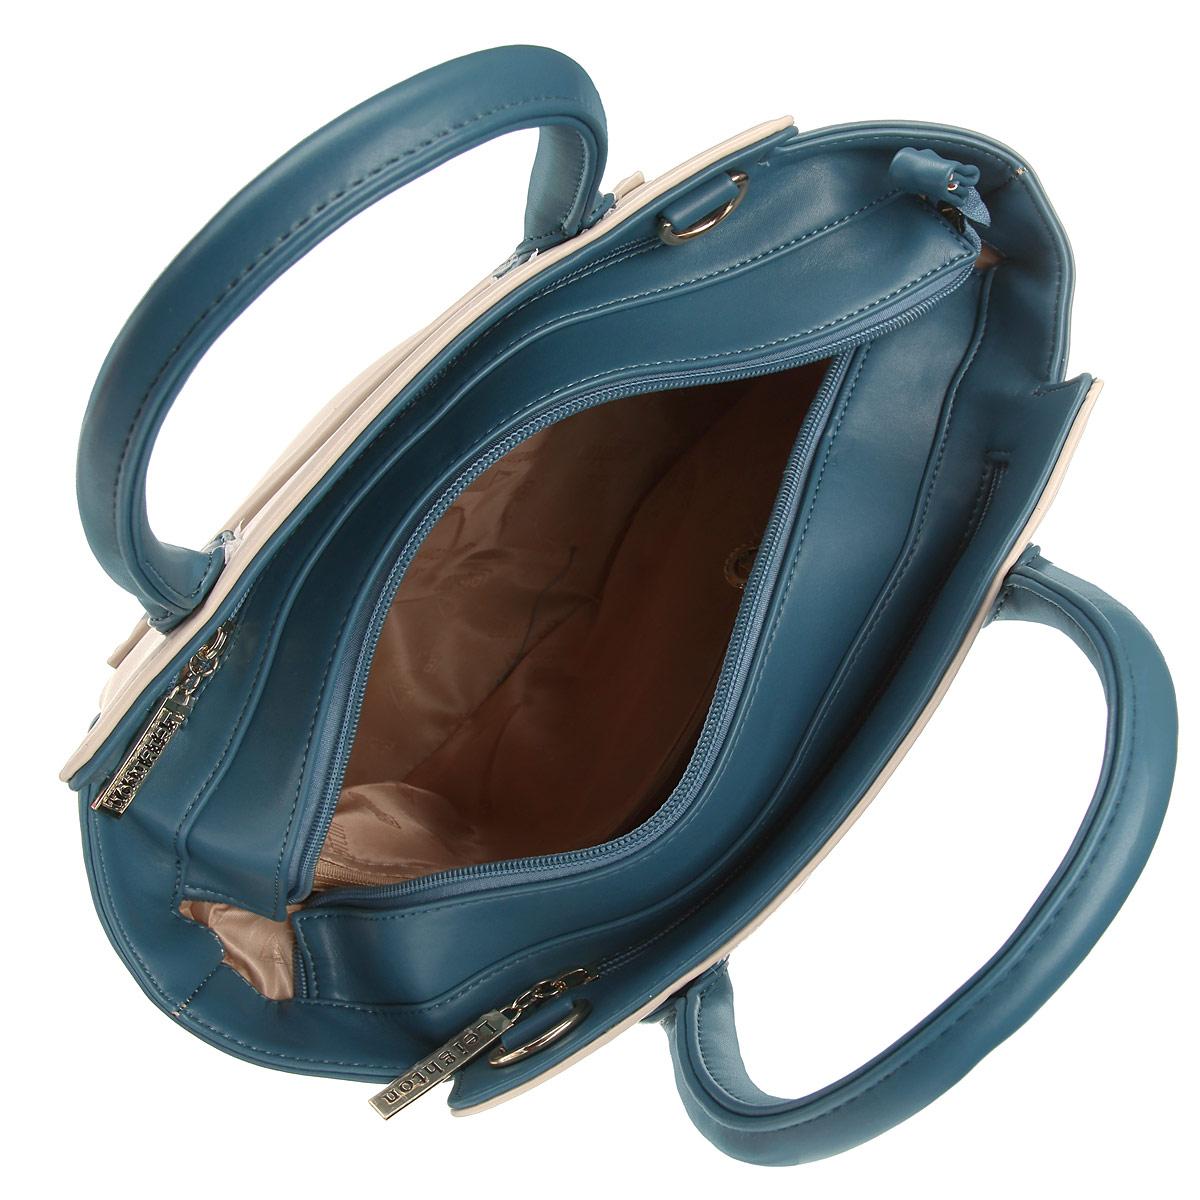 Сумка женская Leighton, цвет: бежевый, синий. 570270-082/11/082/670 беж ( 570270-082/11/082/670 беж )